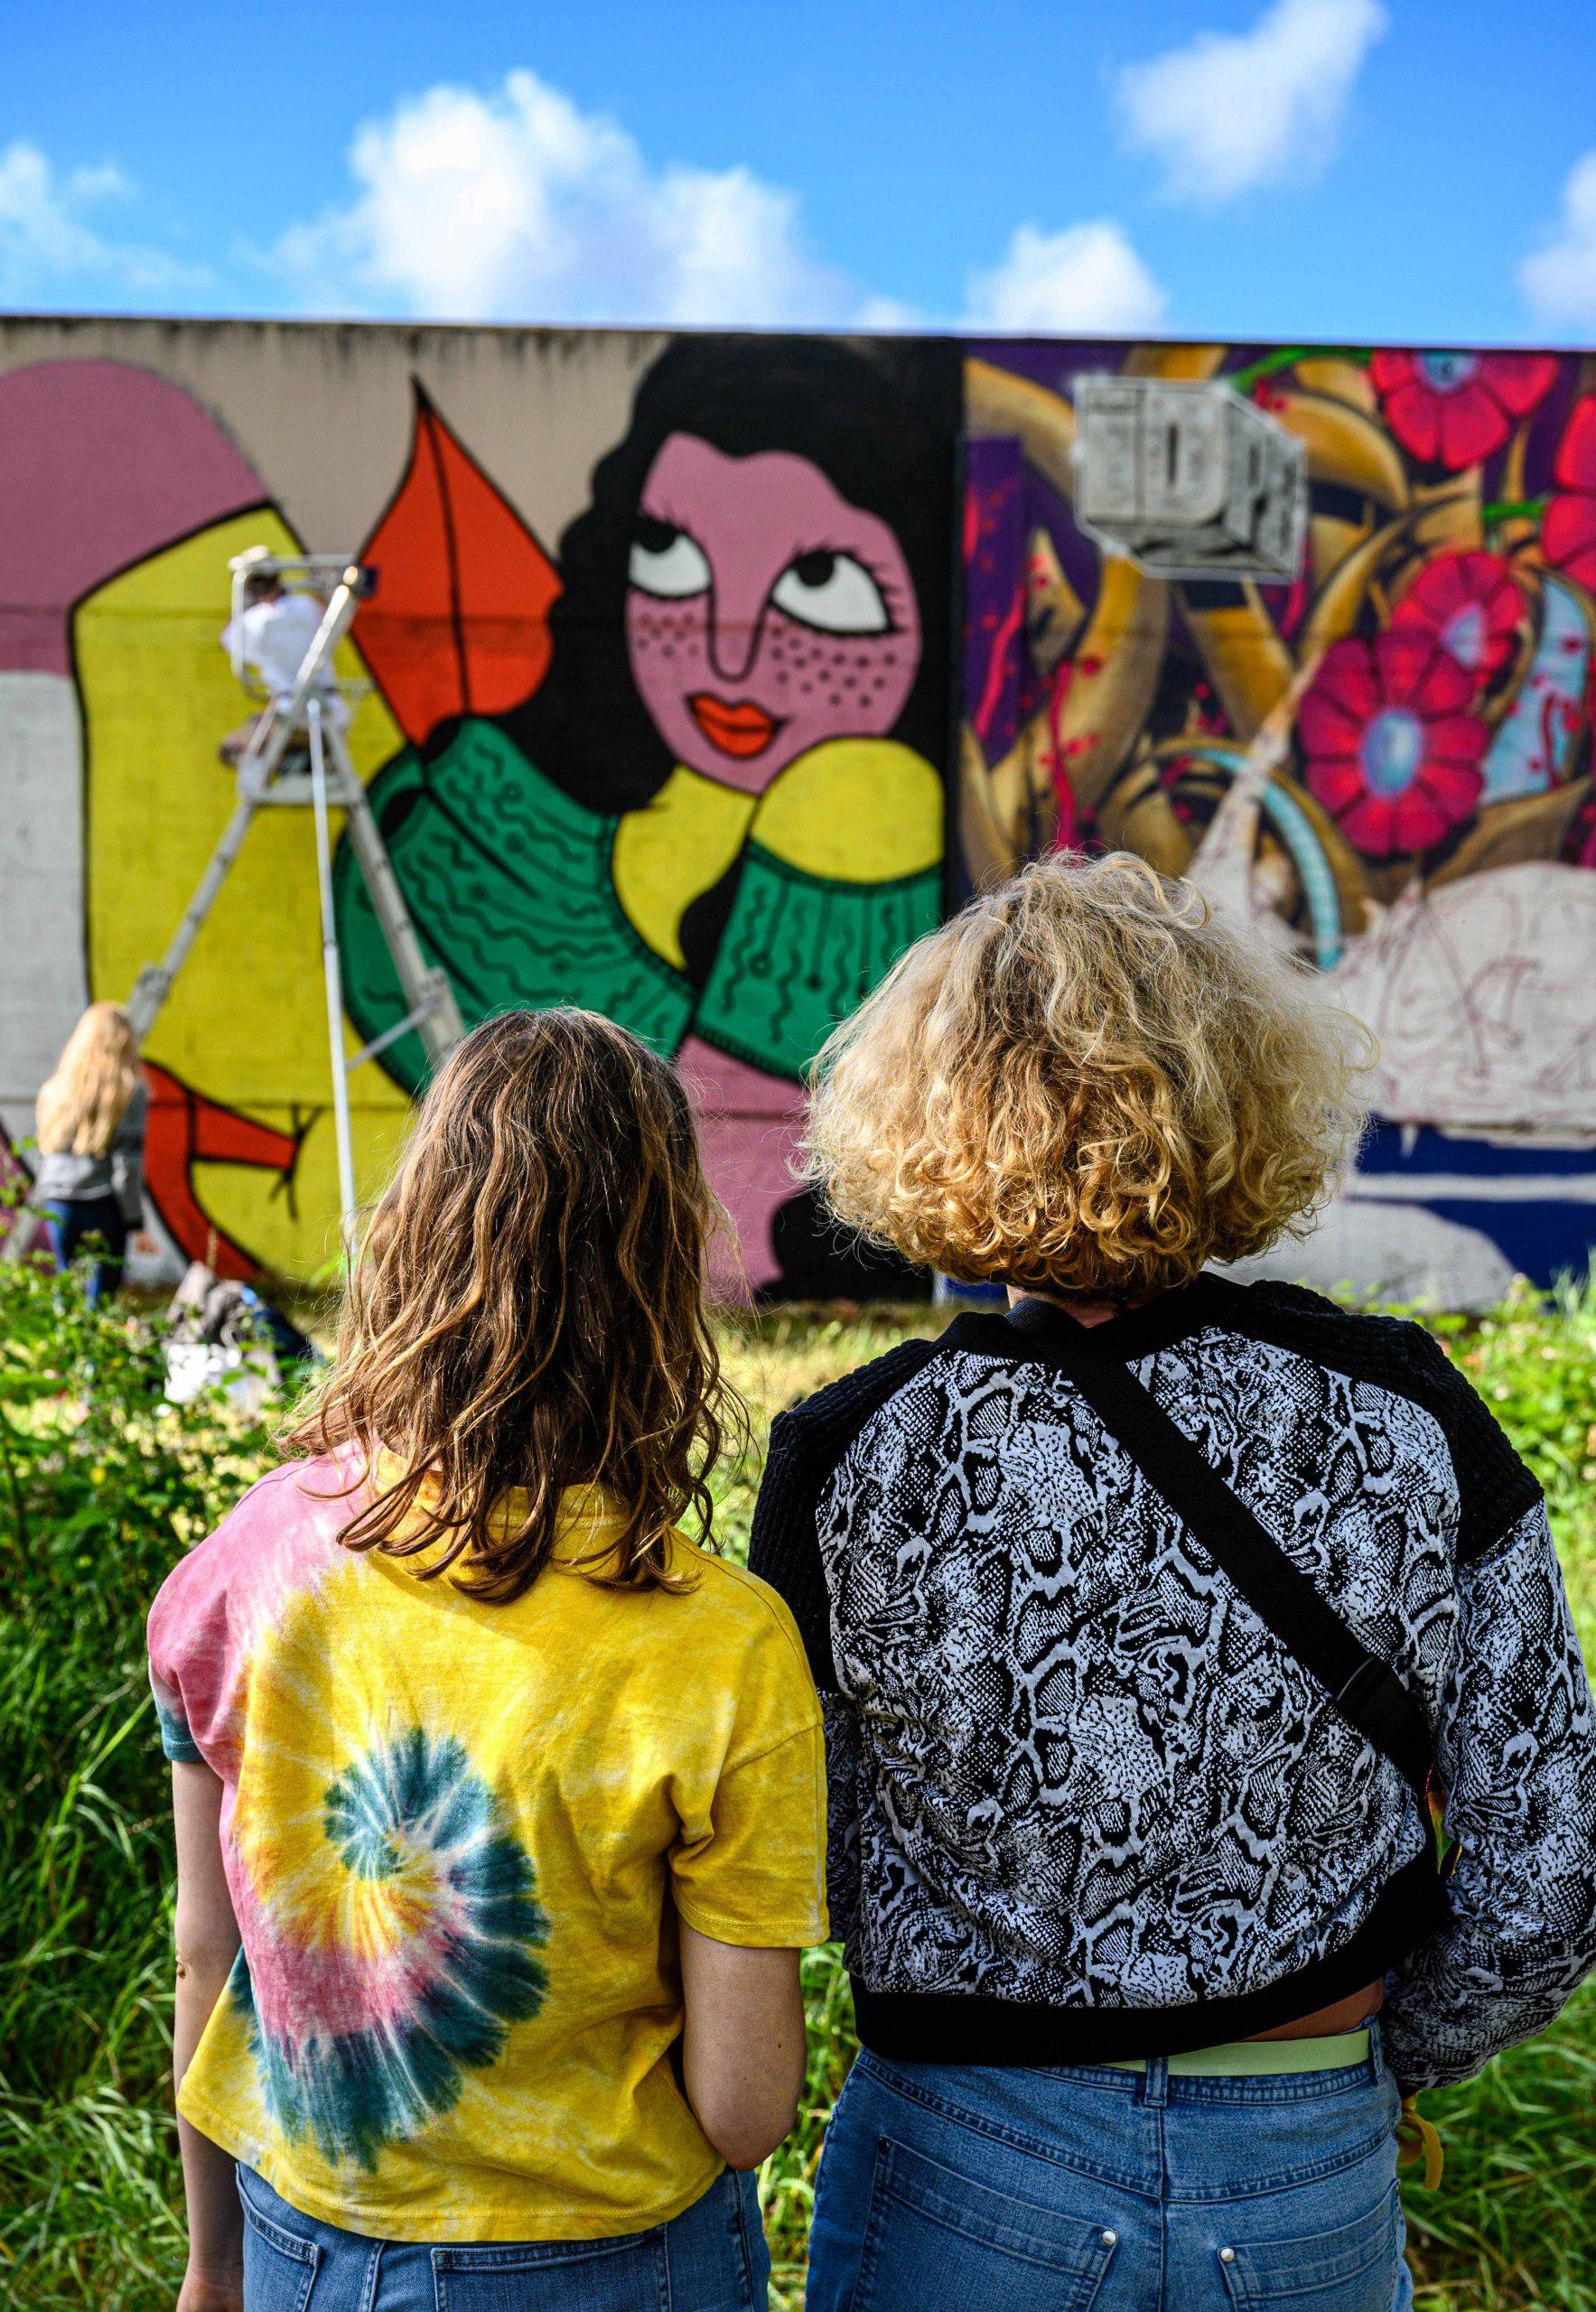 Work in progress de fresque de Floe (gauche) et de Loodz (droite) durant l'Urban Art Jungle Festival 05 en 2019